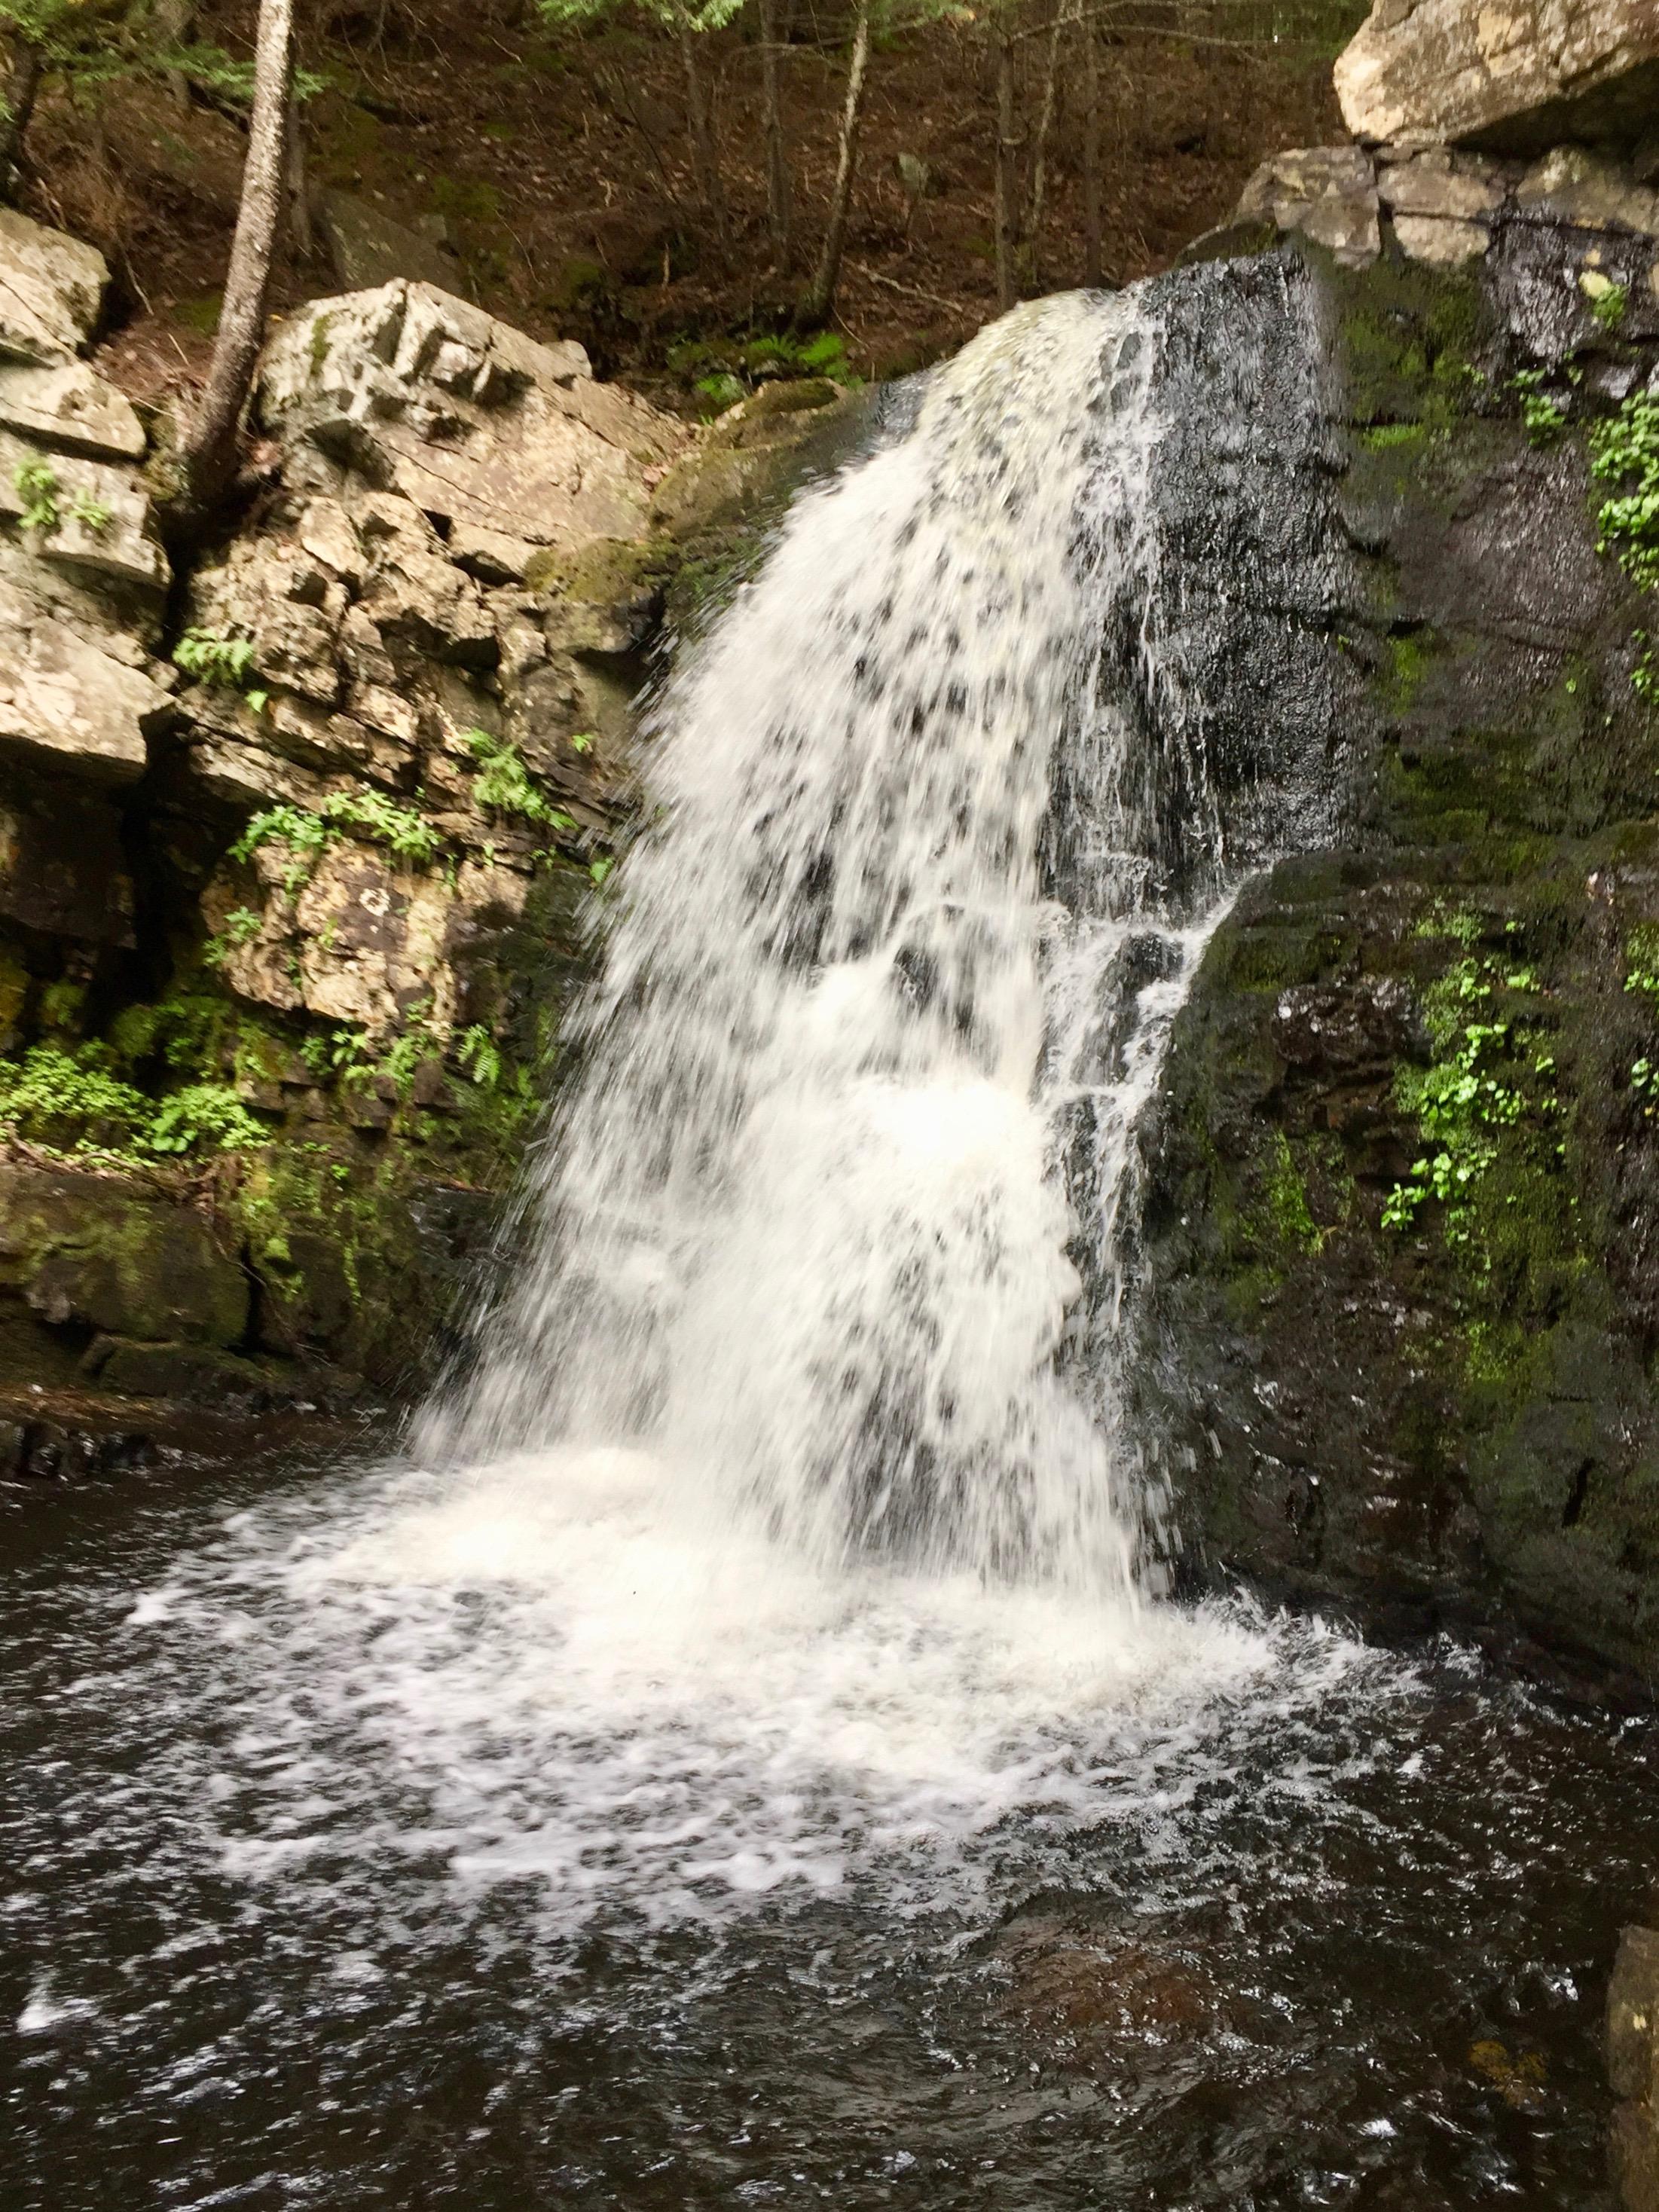 Ettinger Falls, Three Mile Plains, Nova Scotia - Ettinger Falls